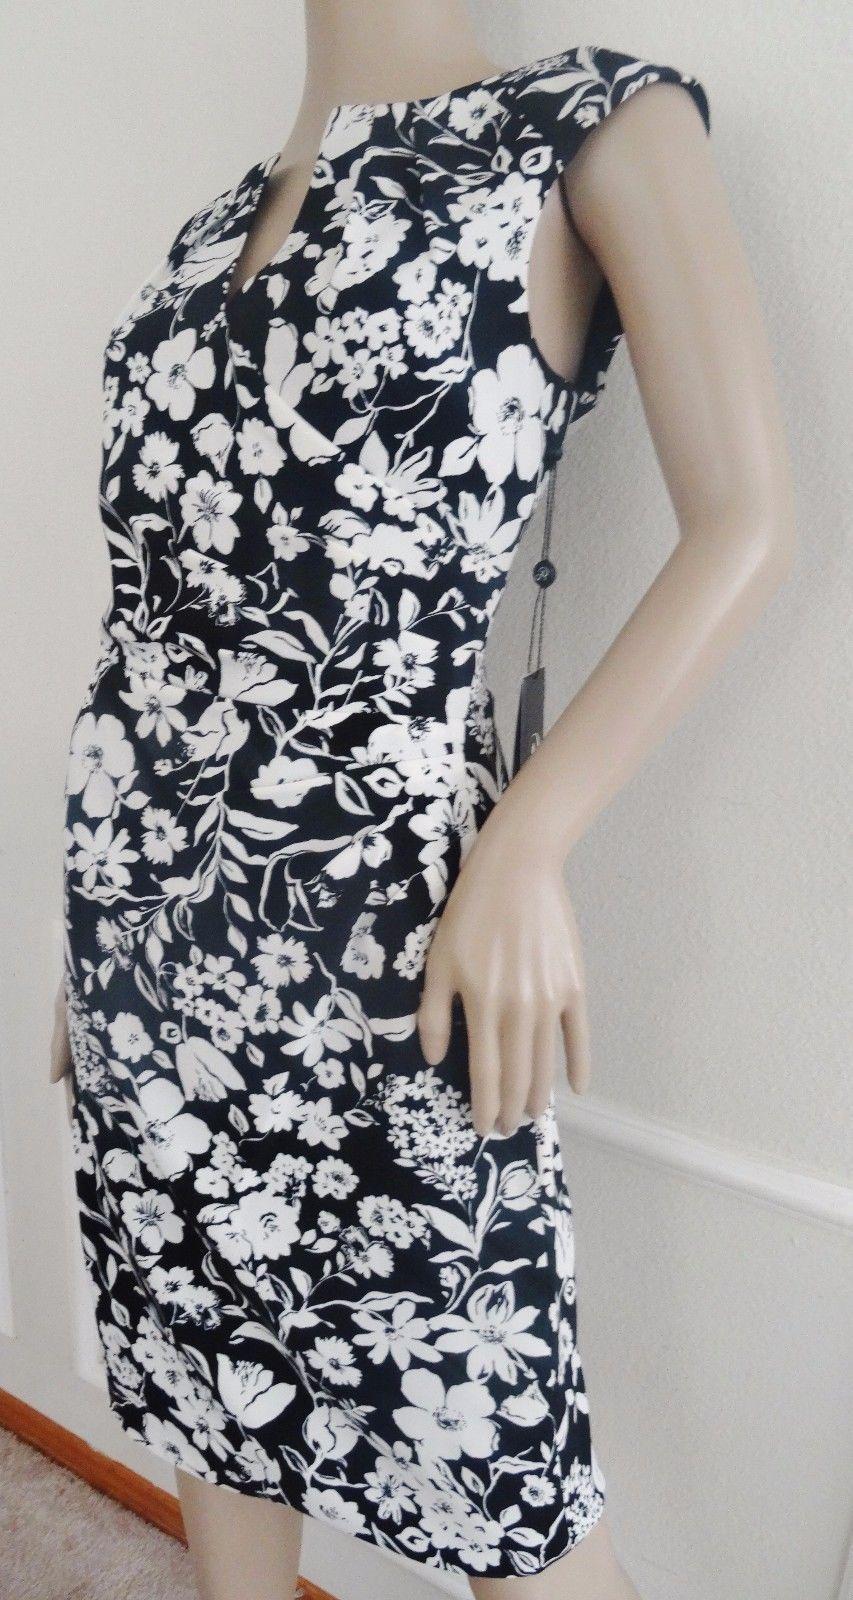 Nwt Adrianna Papell Cap Sleeve Drape Work Sheath Dress Sz 4 Black White Floral